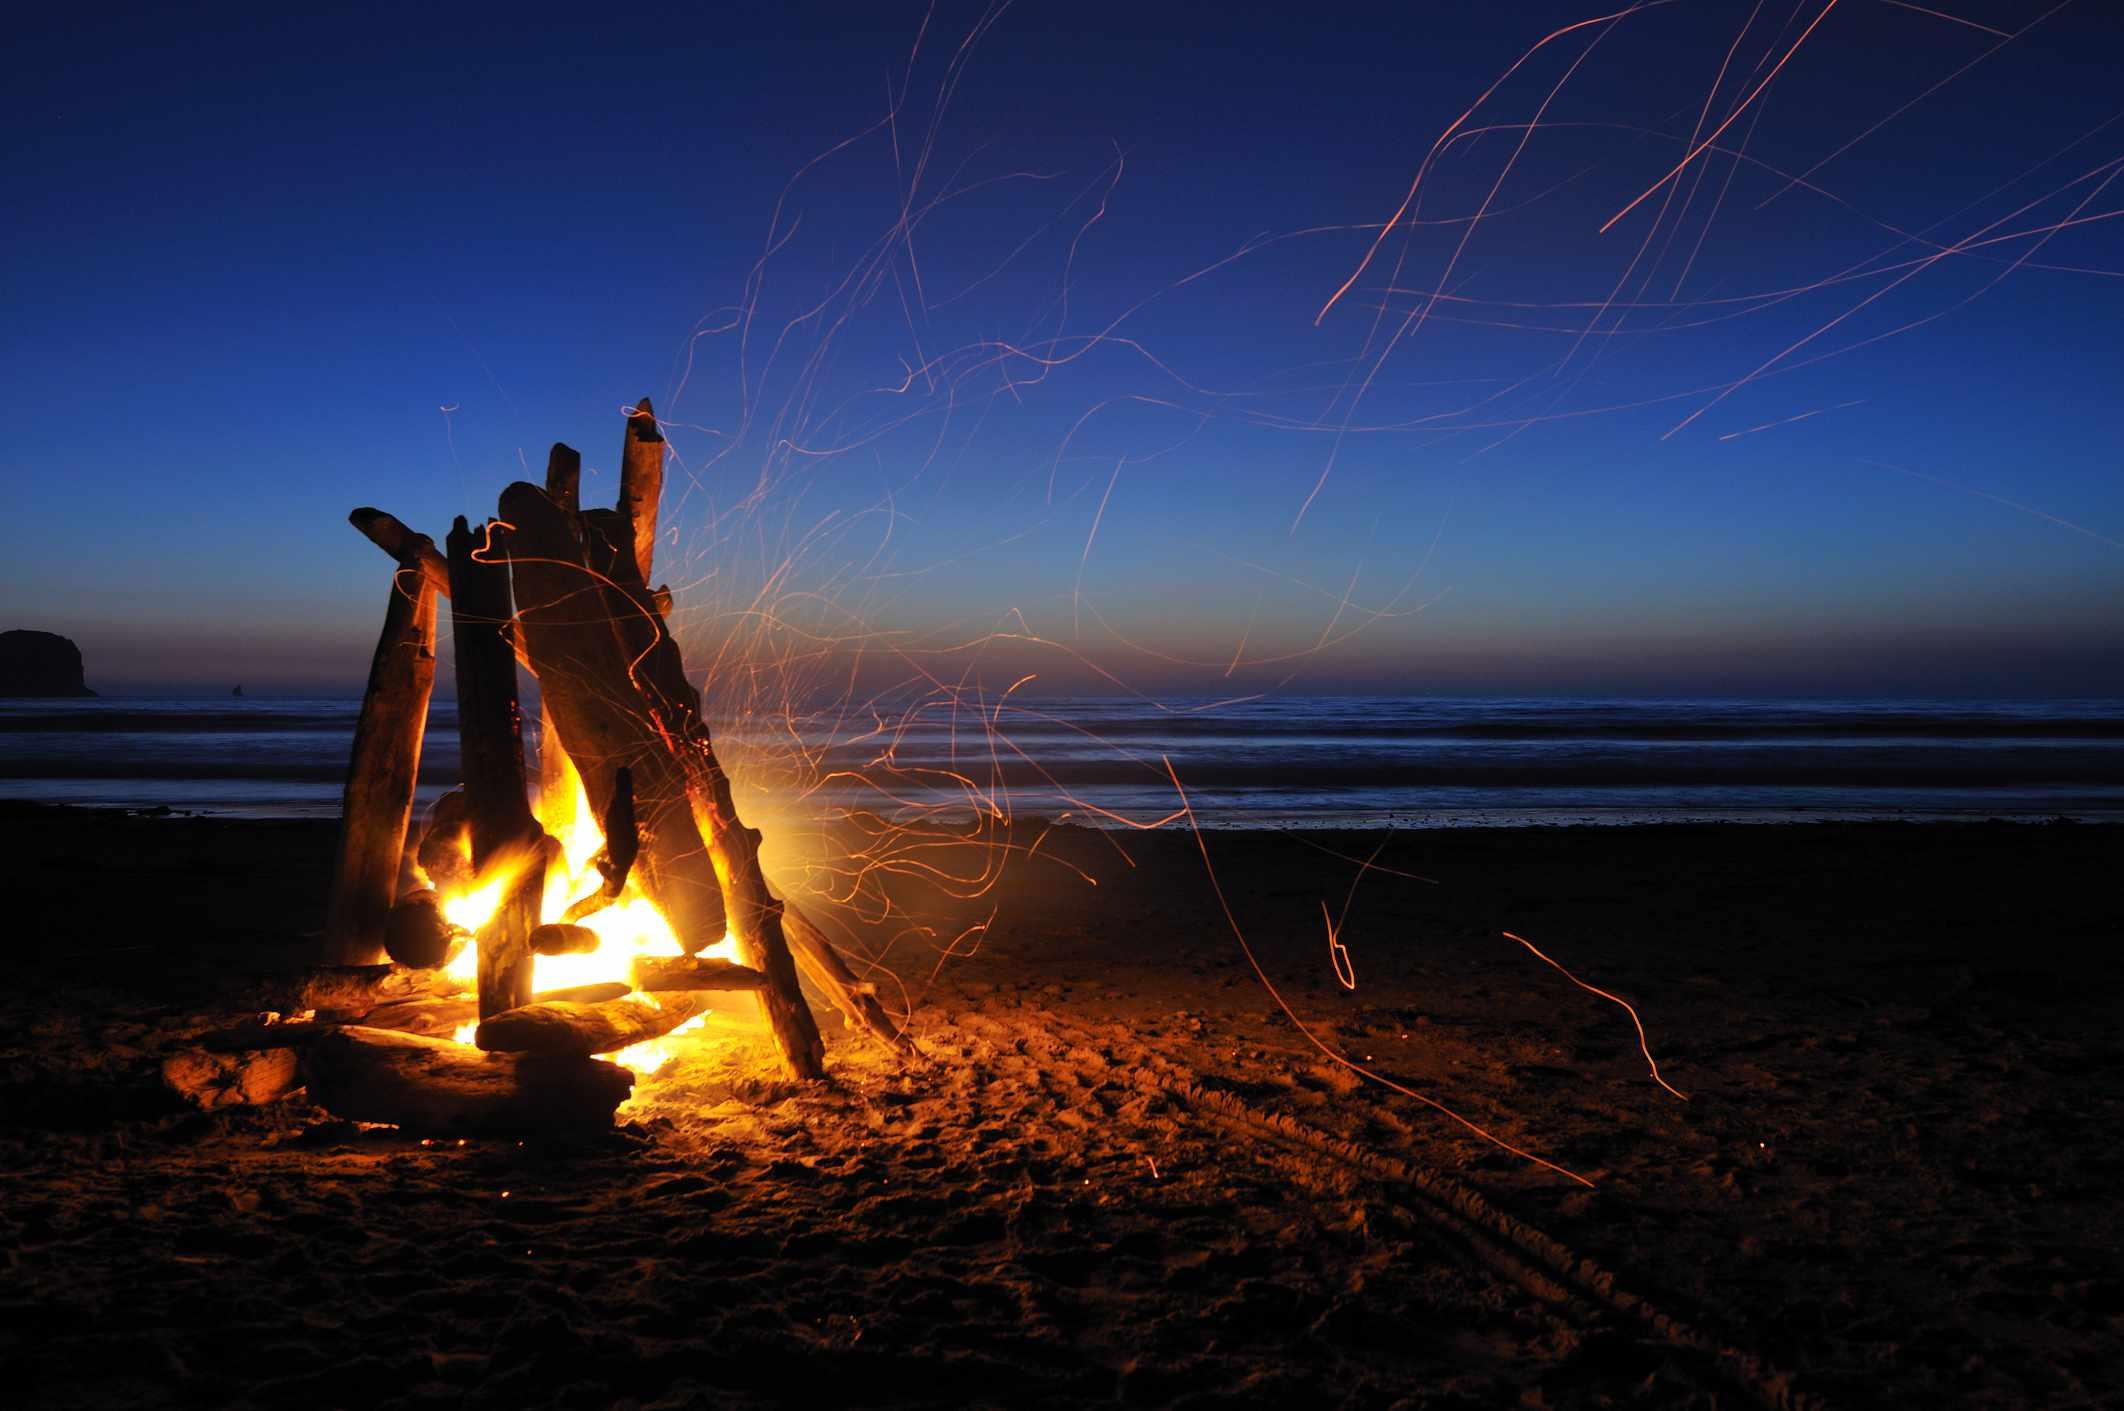 Campfire on a beach